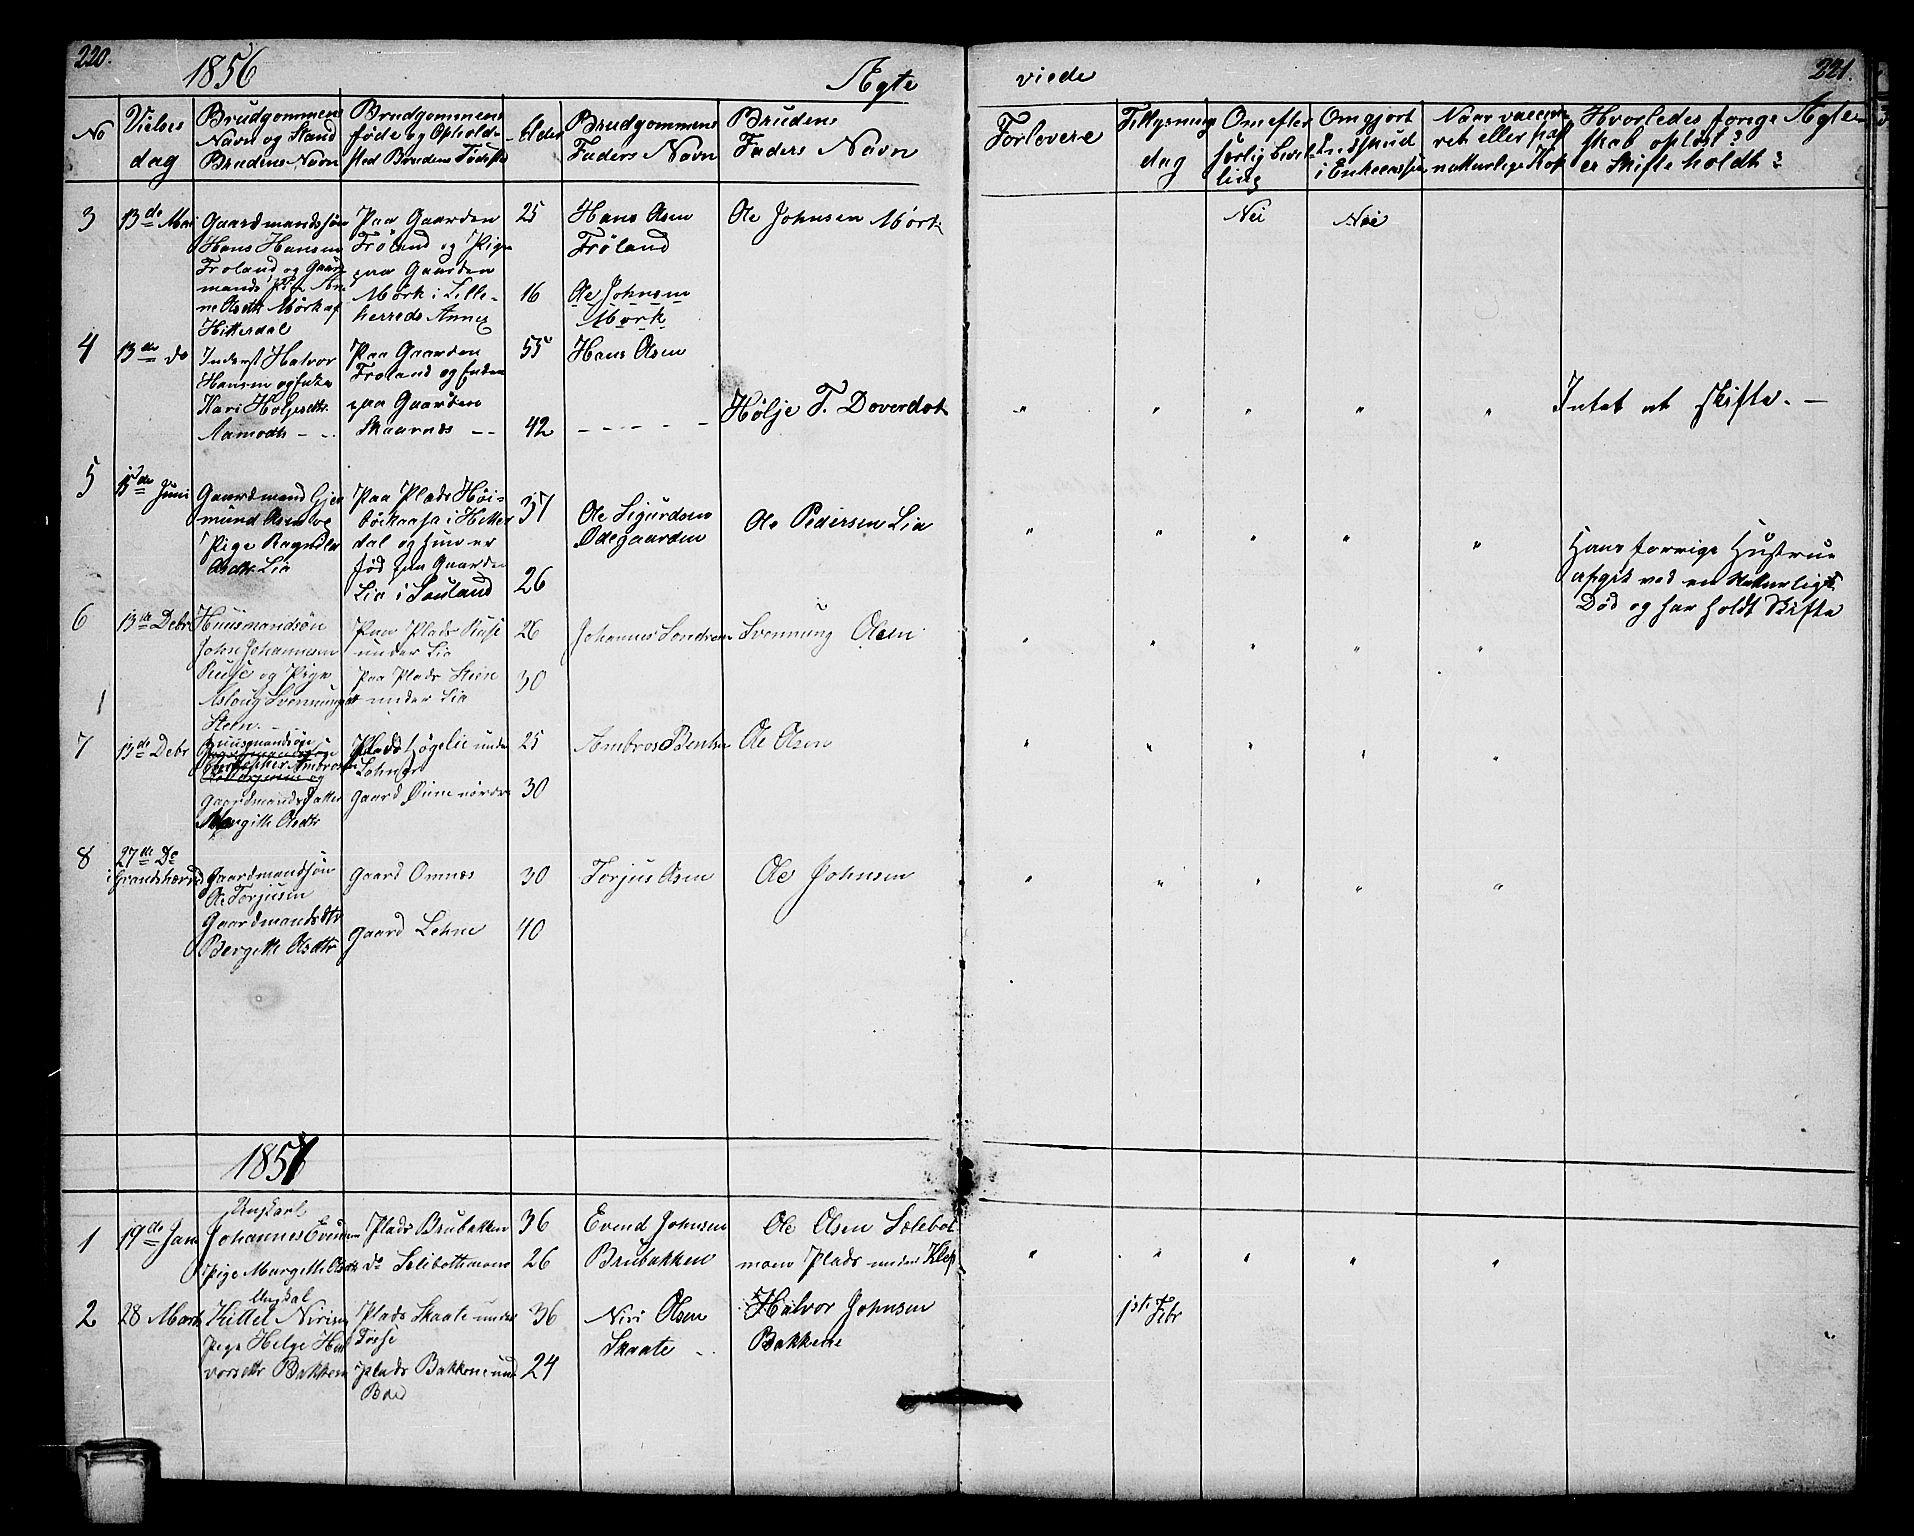 SAKO, Hjartdal kirkebøker, G/Gb/L0002: Klokkerbok nr. II 2, 1854-1884, s. 220-221